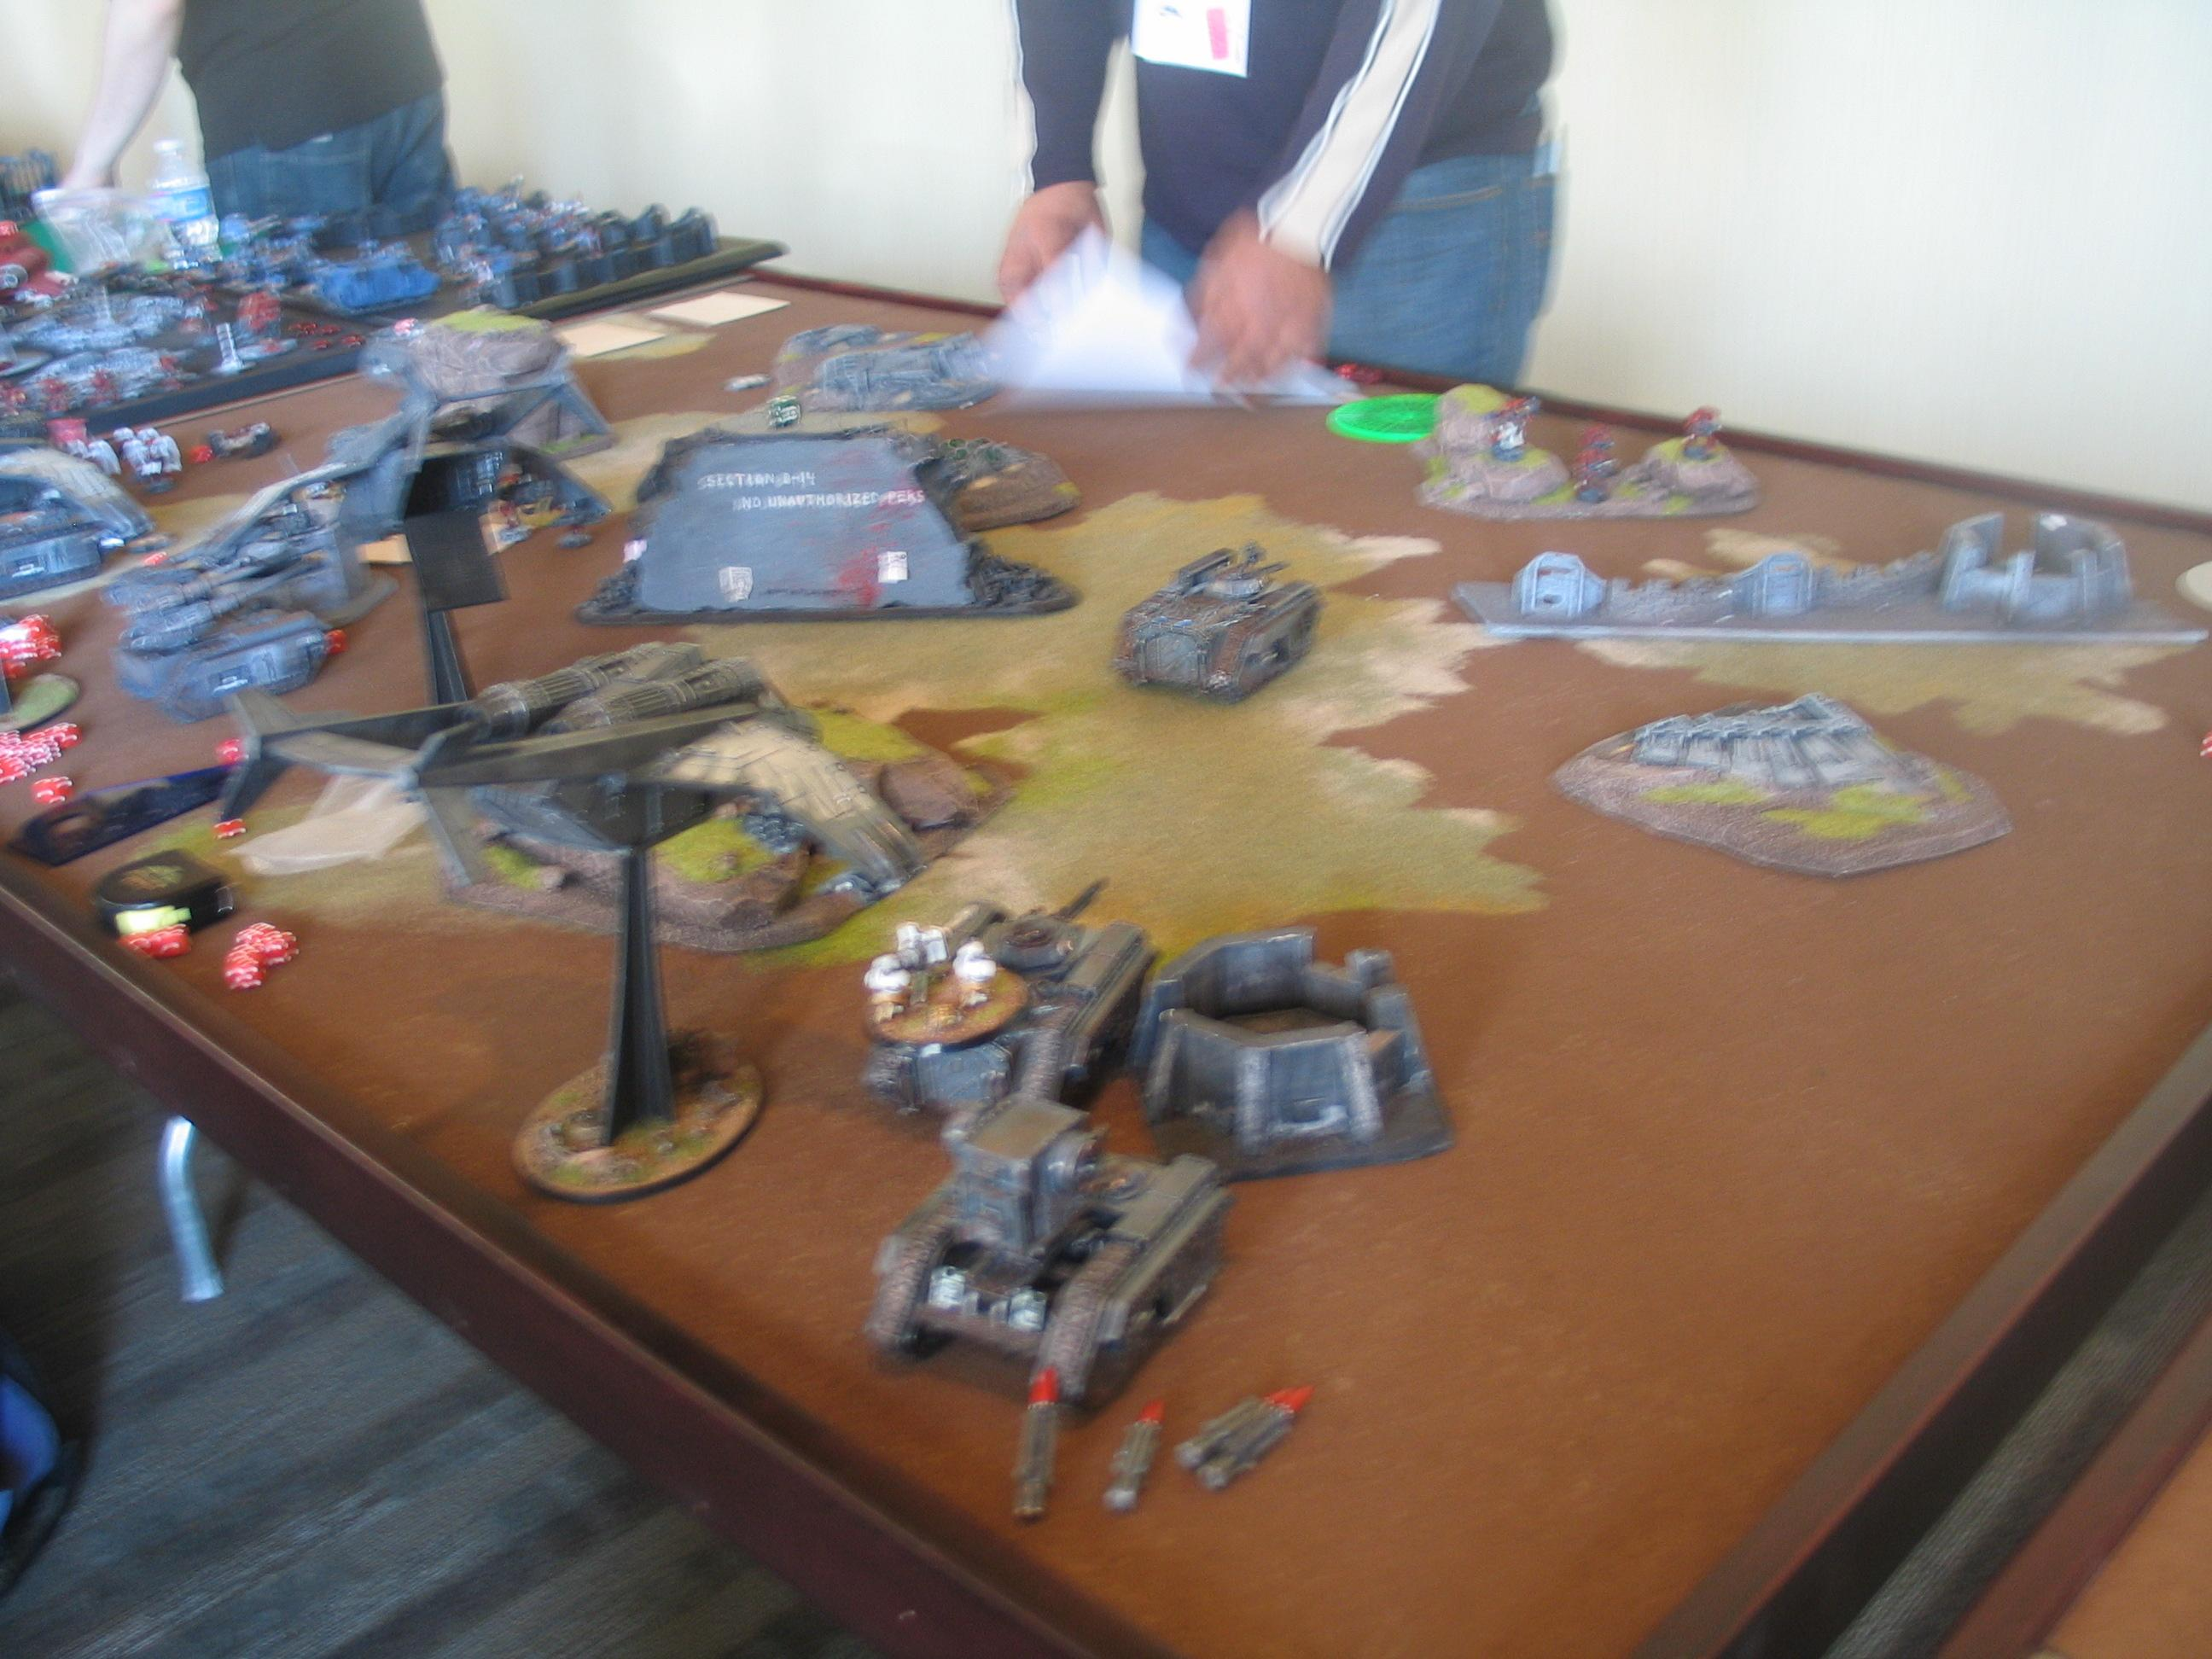 Colonial Gt 2011, Warhammer 40,000